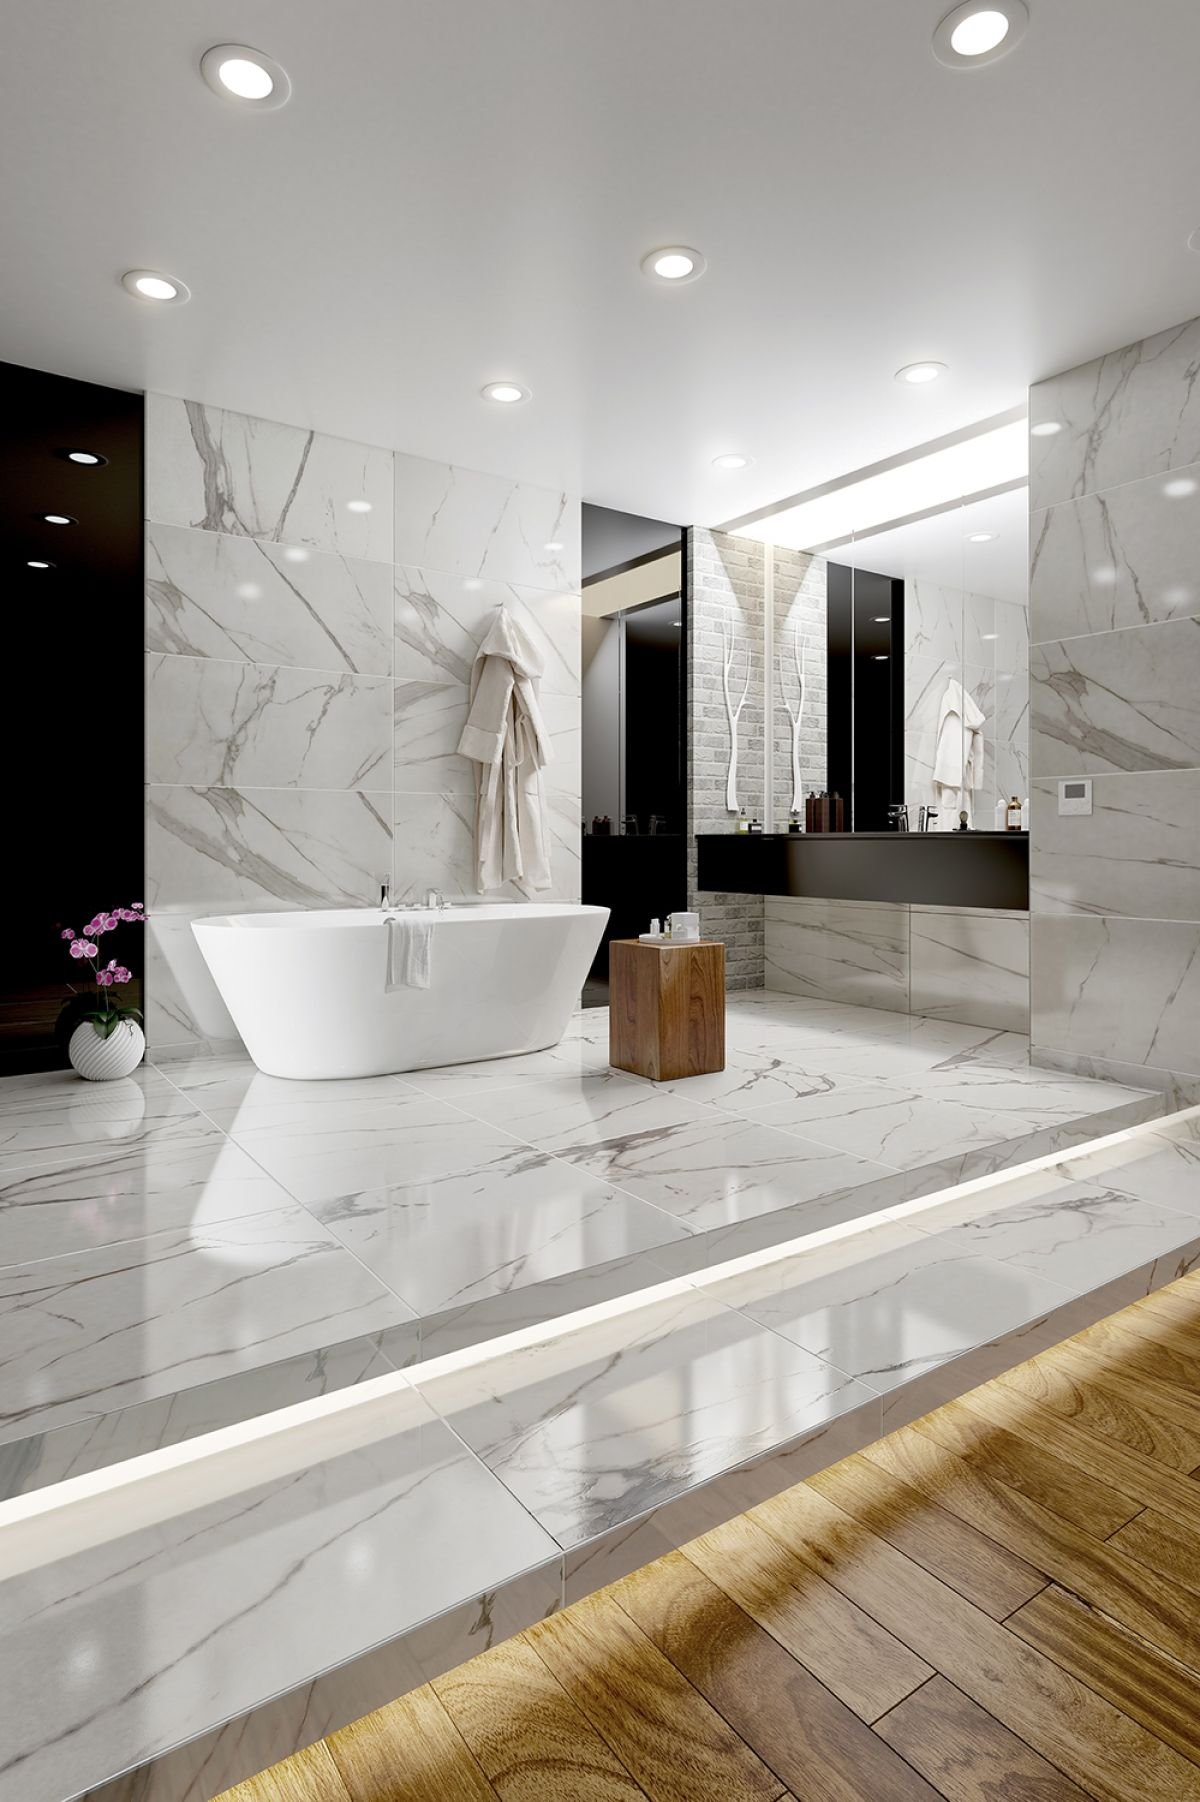 Royal Marble Polished Porcelain Tiles 45 x 90 cm | Yurtbay ...